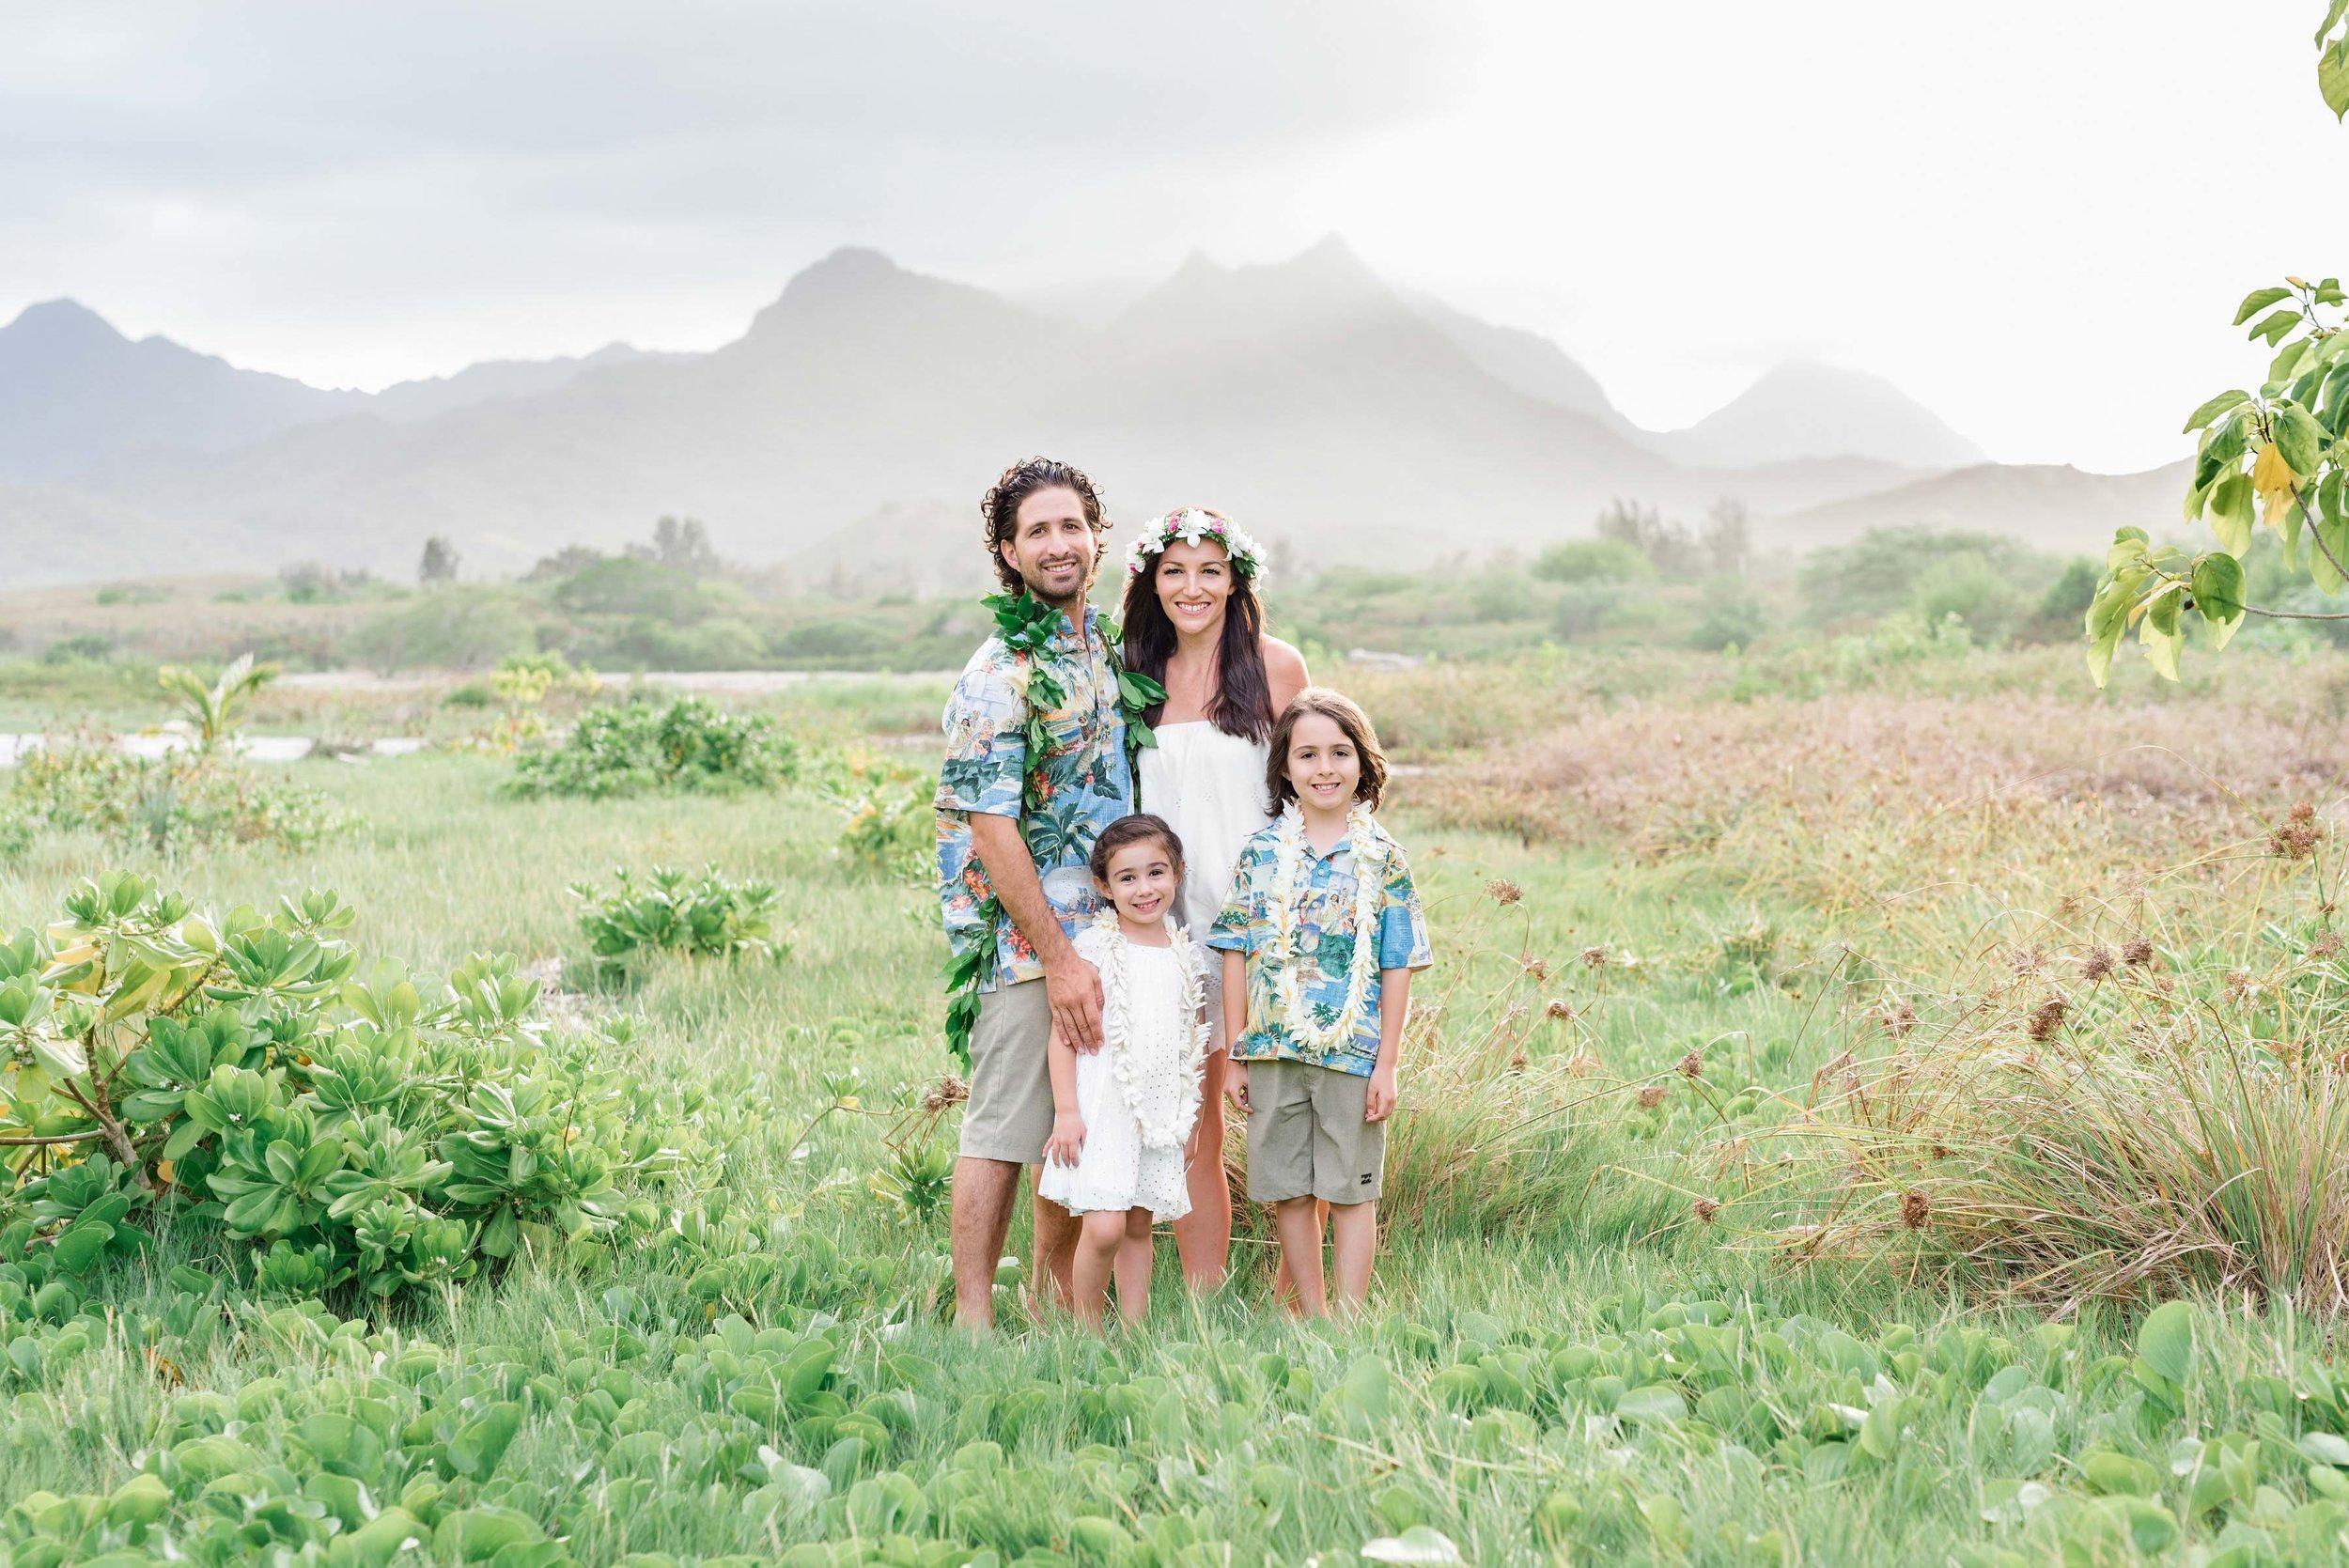 Oahu Family Photographers | Honolulu Beach Family Portrait Photographer